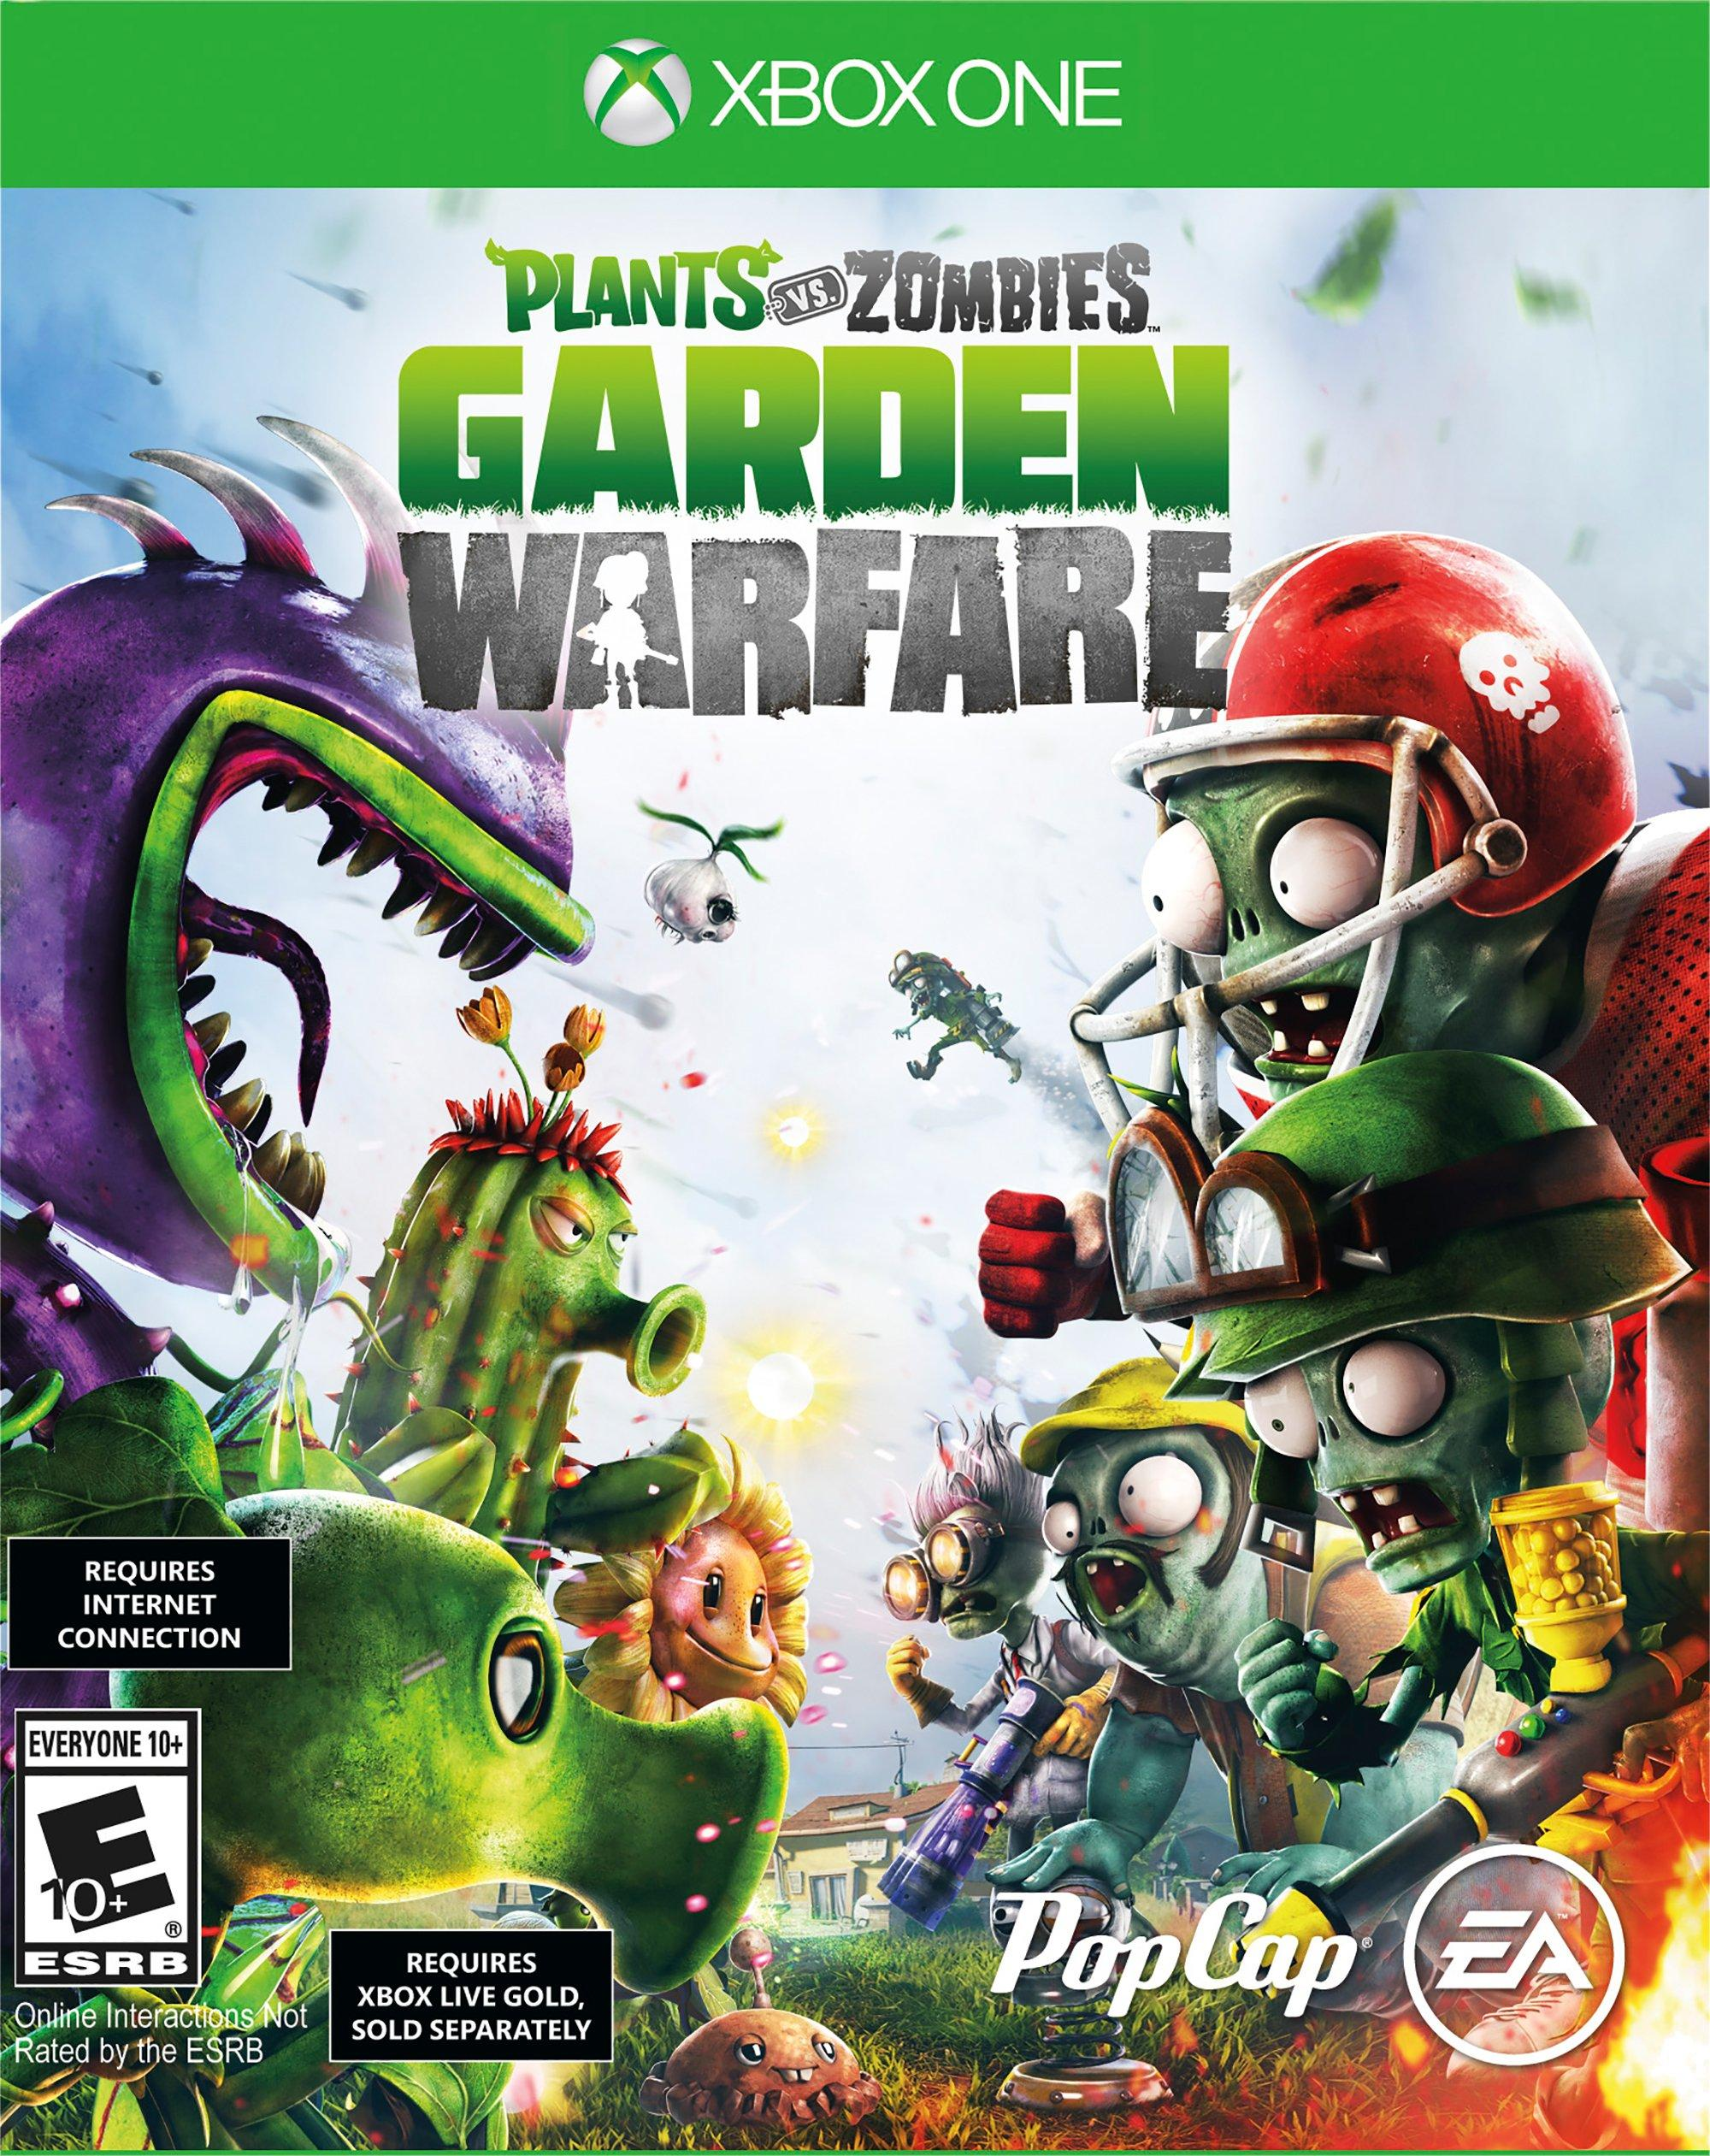 Plants vs Zombies Garden Warfare | Xbox One | GameStop